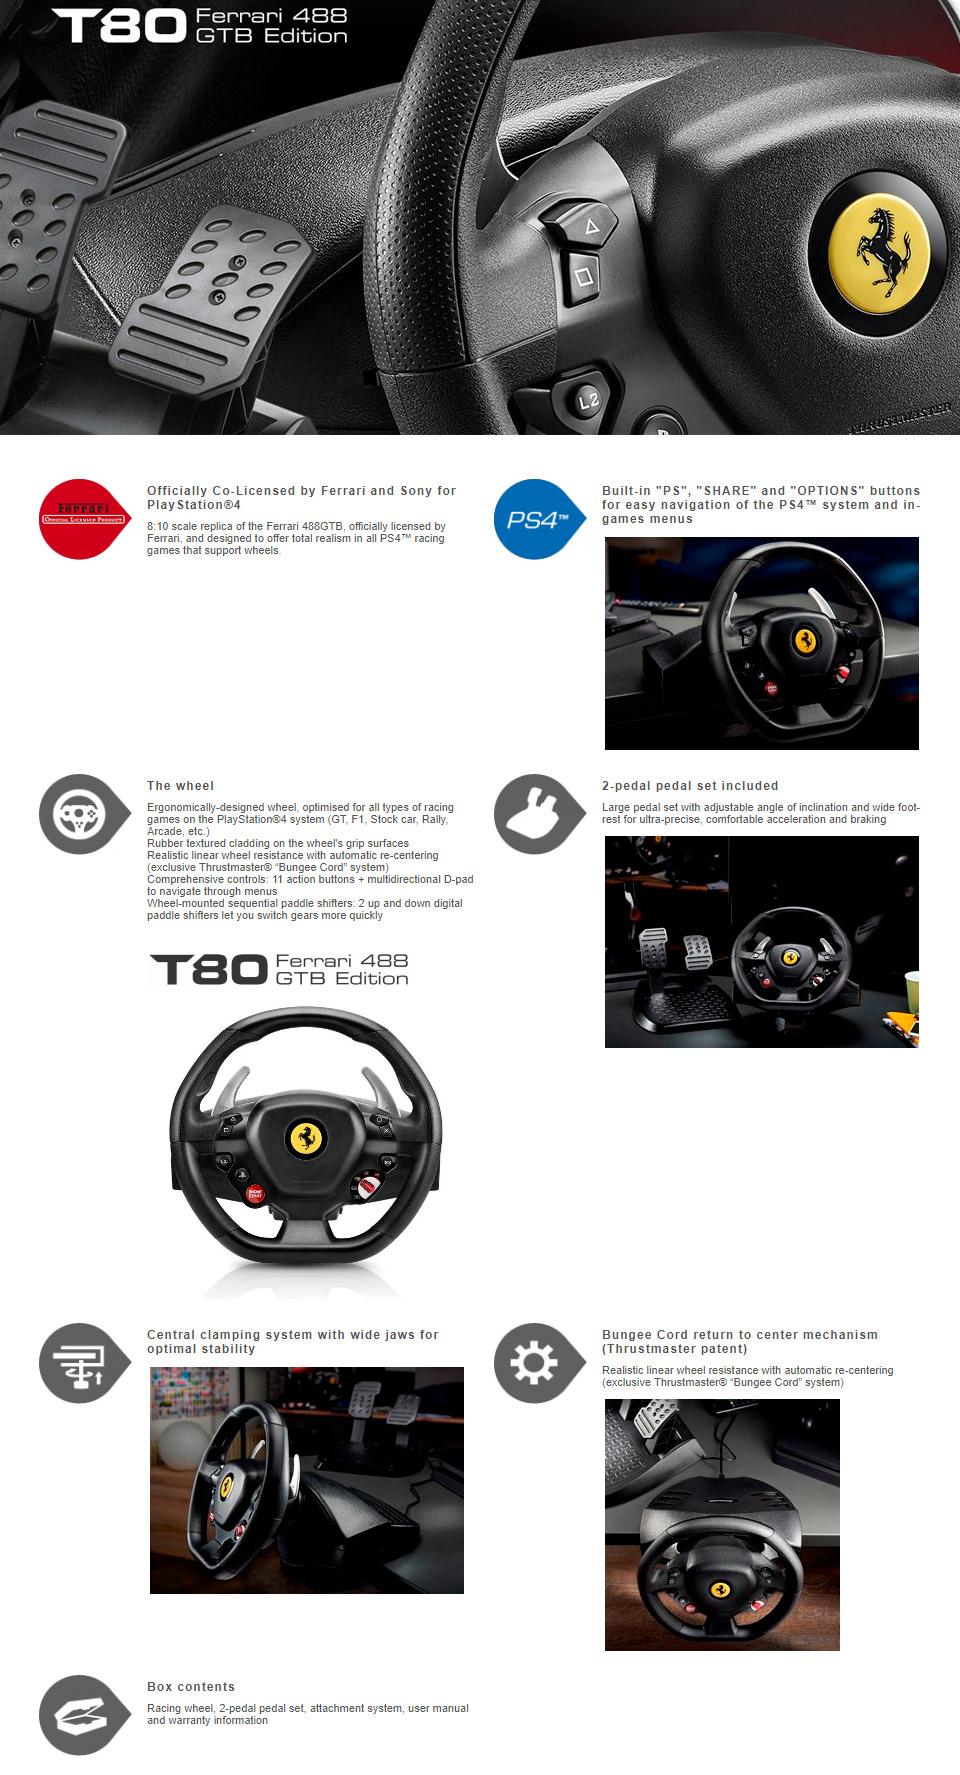 T80 Ferrari 488 Gtb Edition Ps4 Supercars Gallery